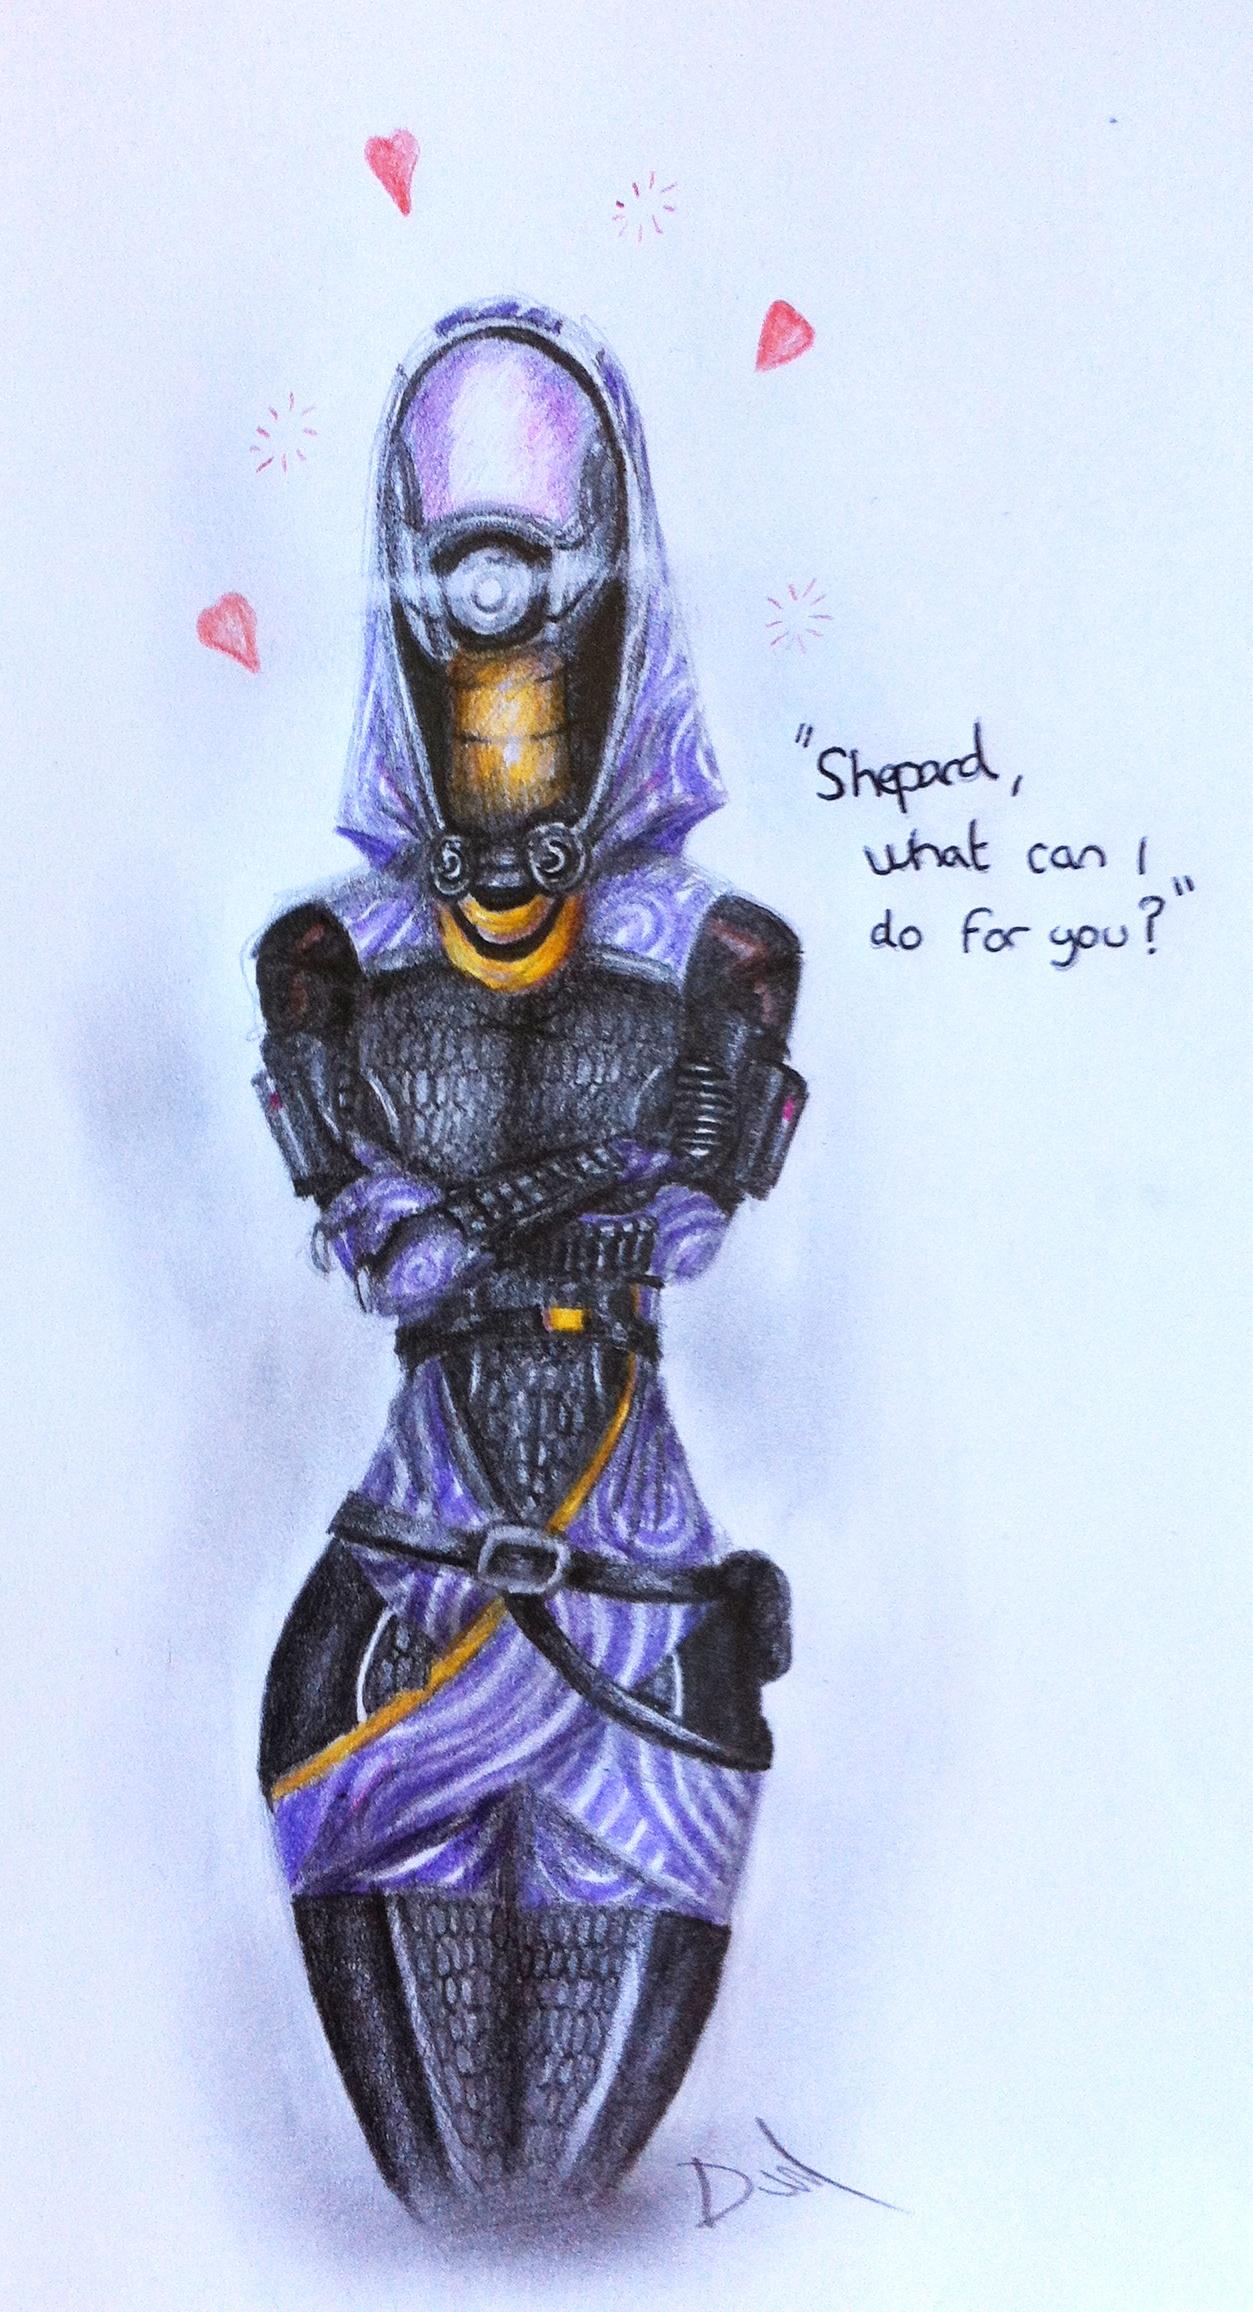 Tali loves Shepard by DavidEllisArtwork